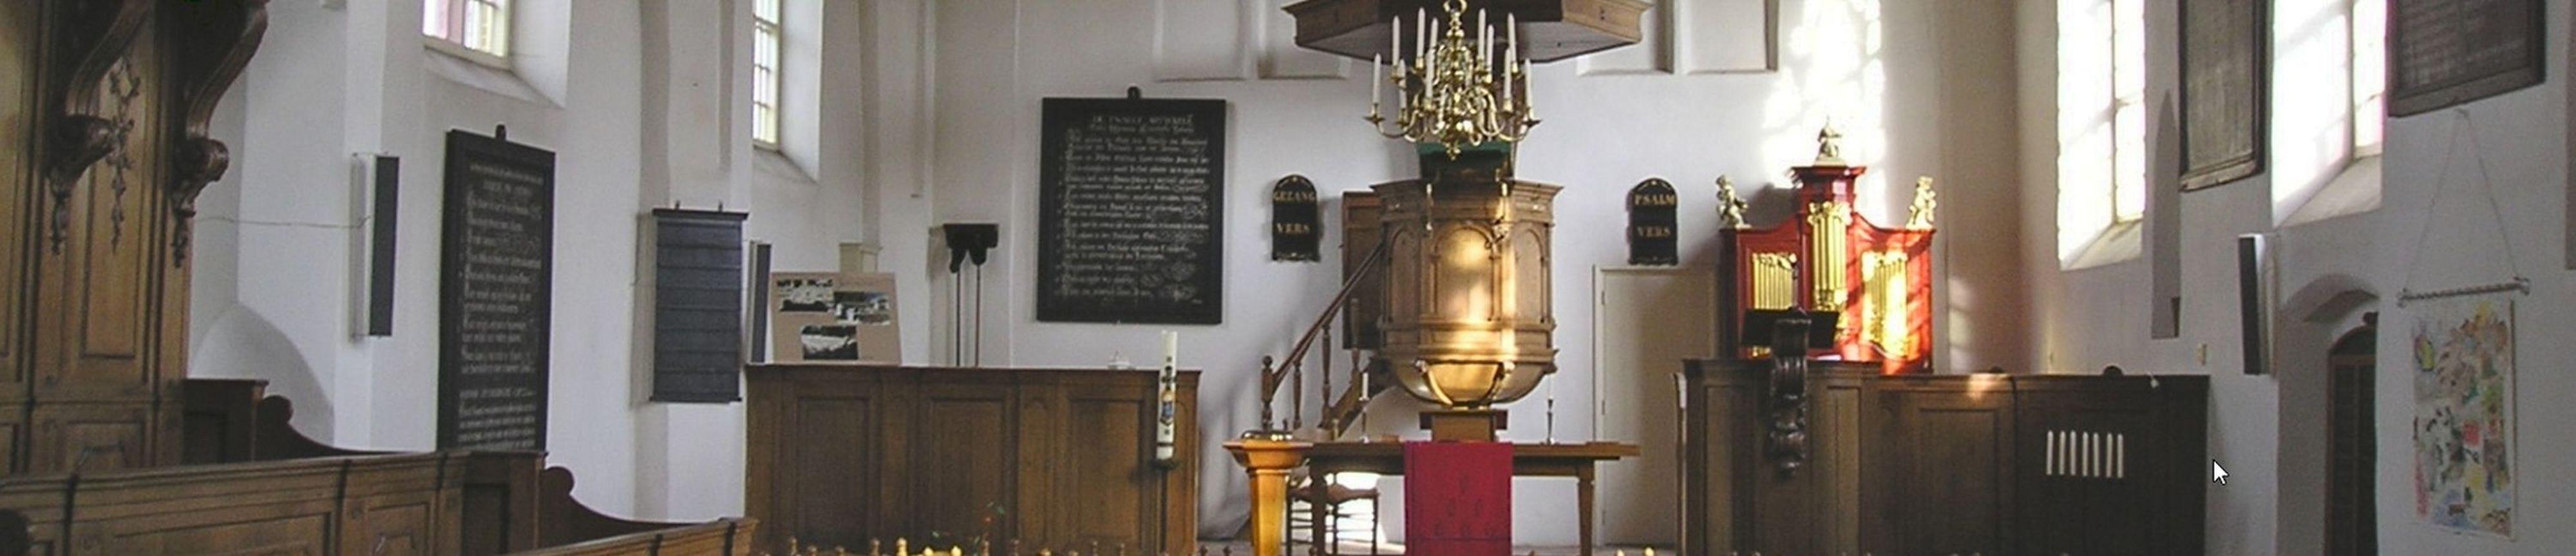 Protestantse kerk Vlijmen